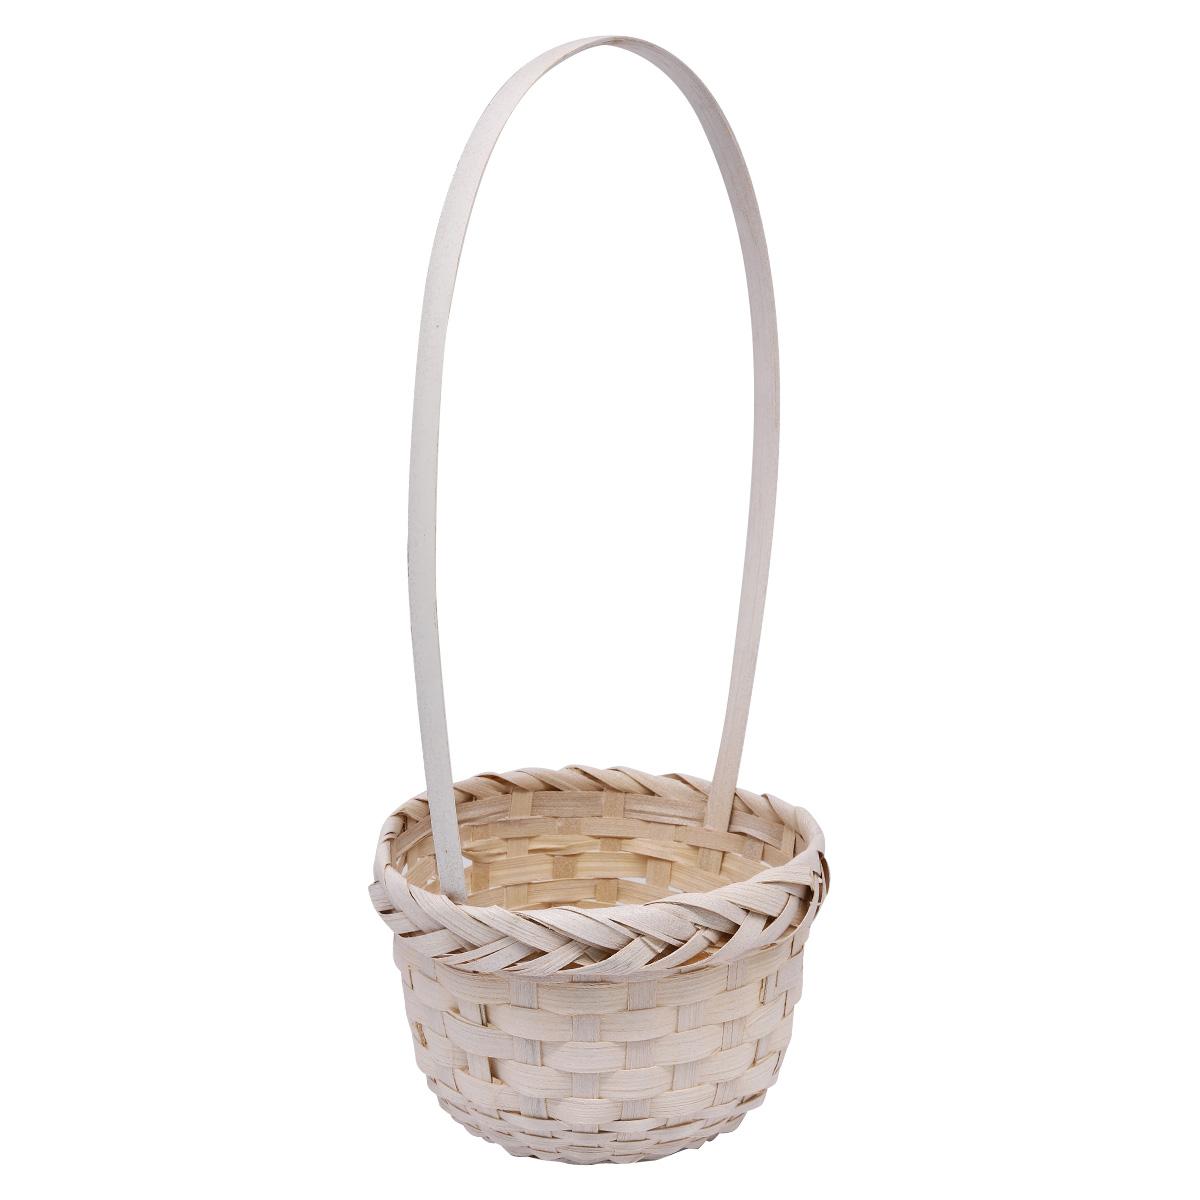 19HJ19087 Корзина плетеная бамбук 15*10*Н29см, цв. белый Астра